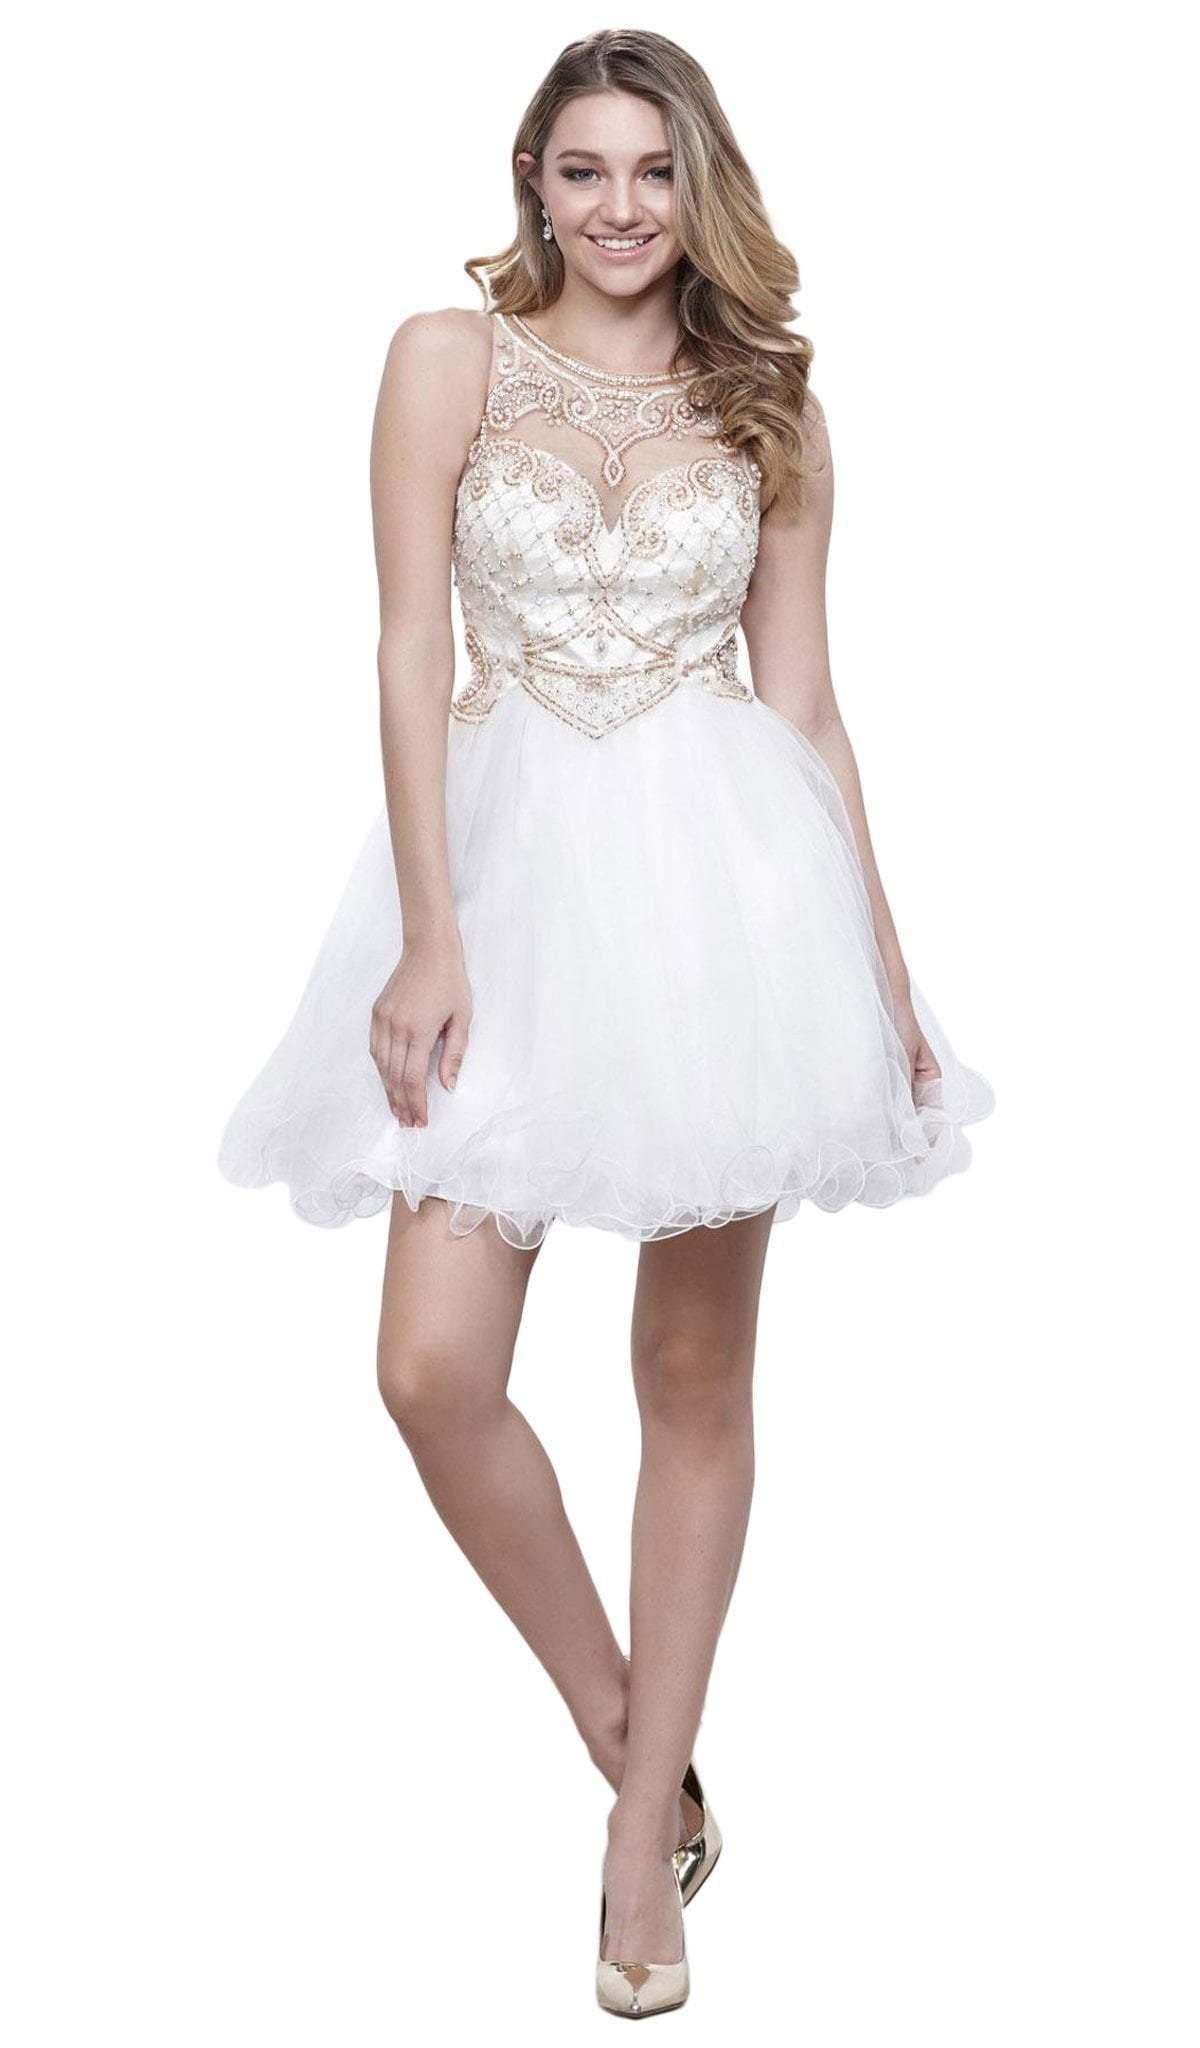 Nox Anabel - 6271 Bead-Embellished Illusion Cocktail Dress